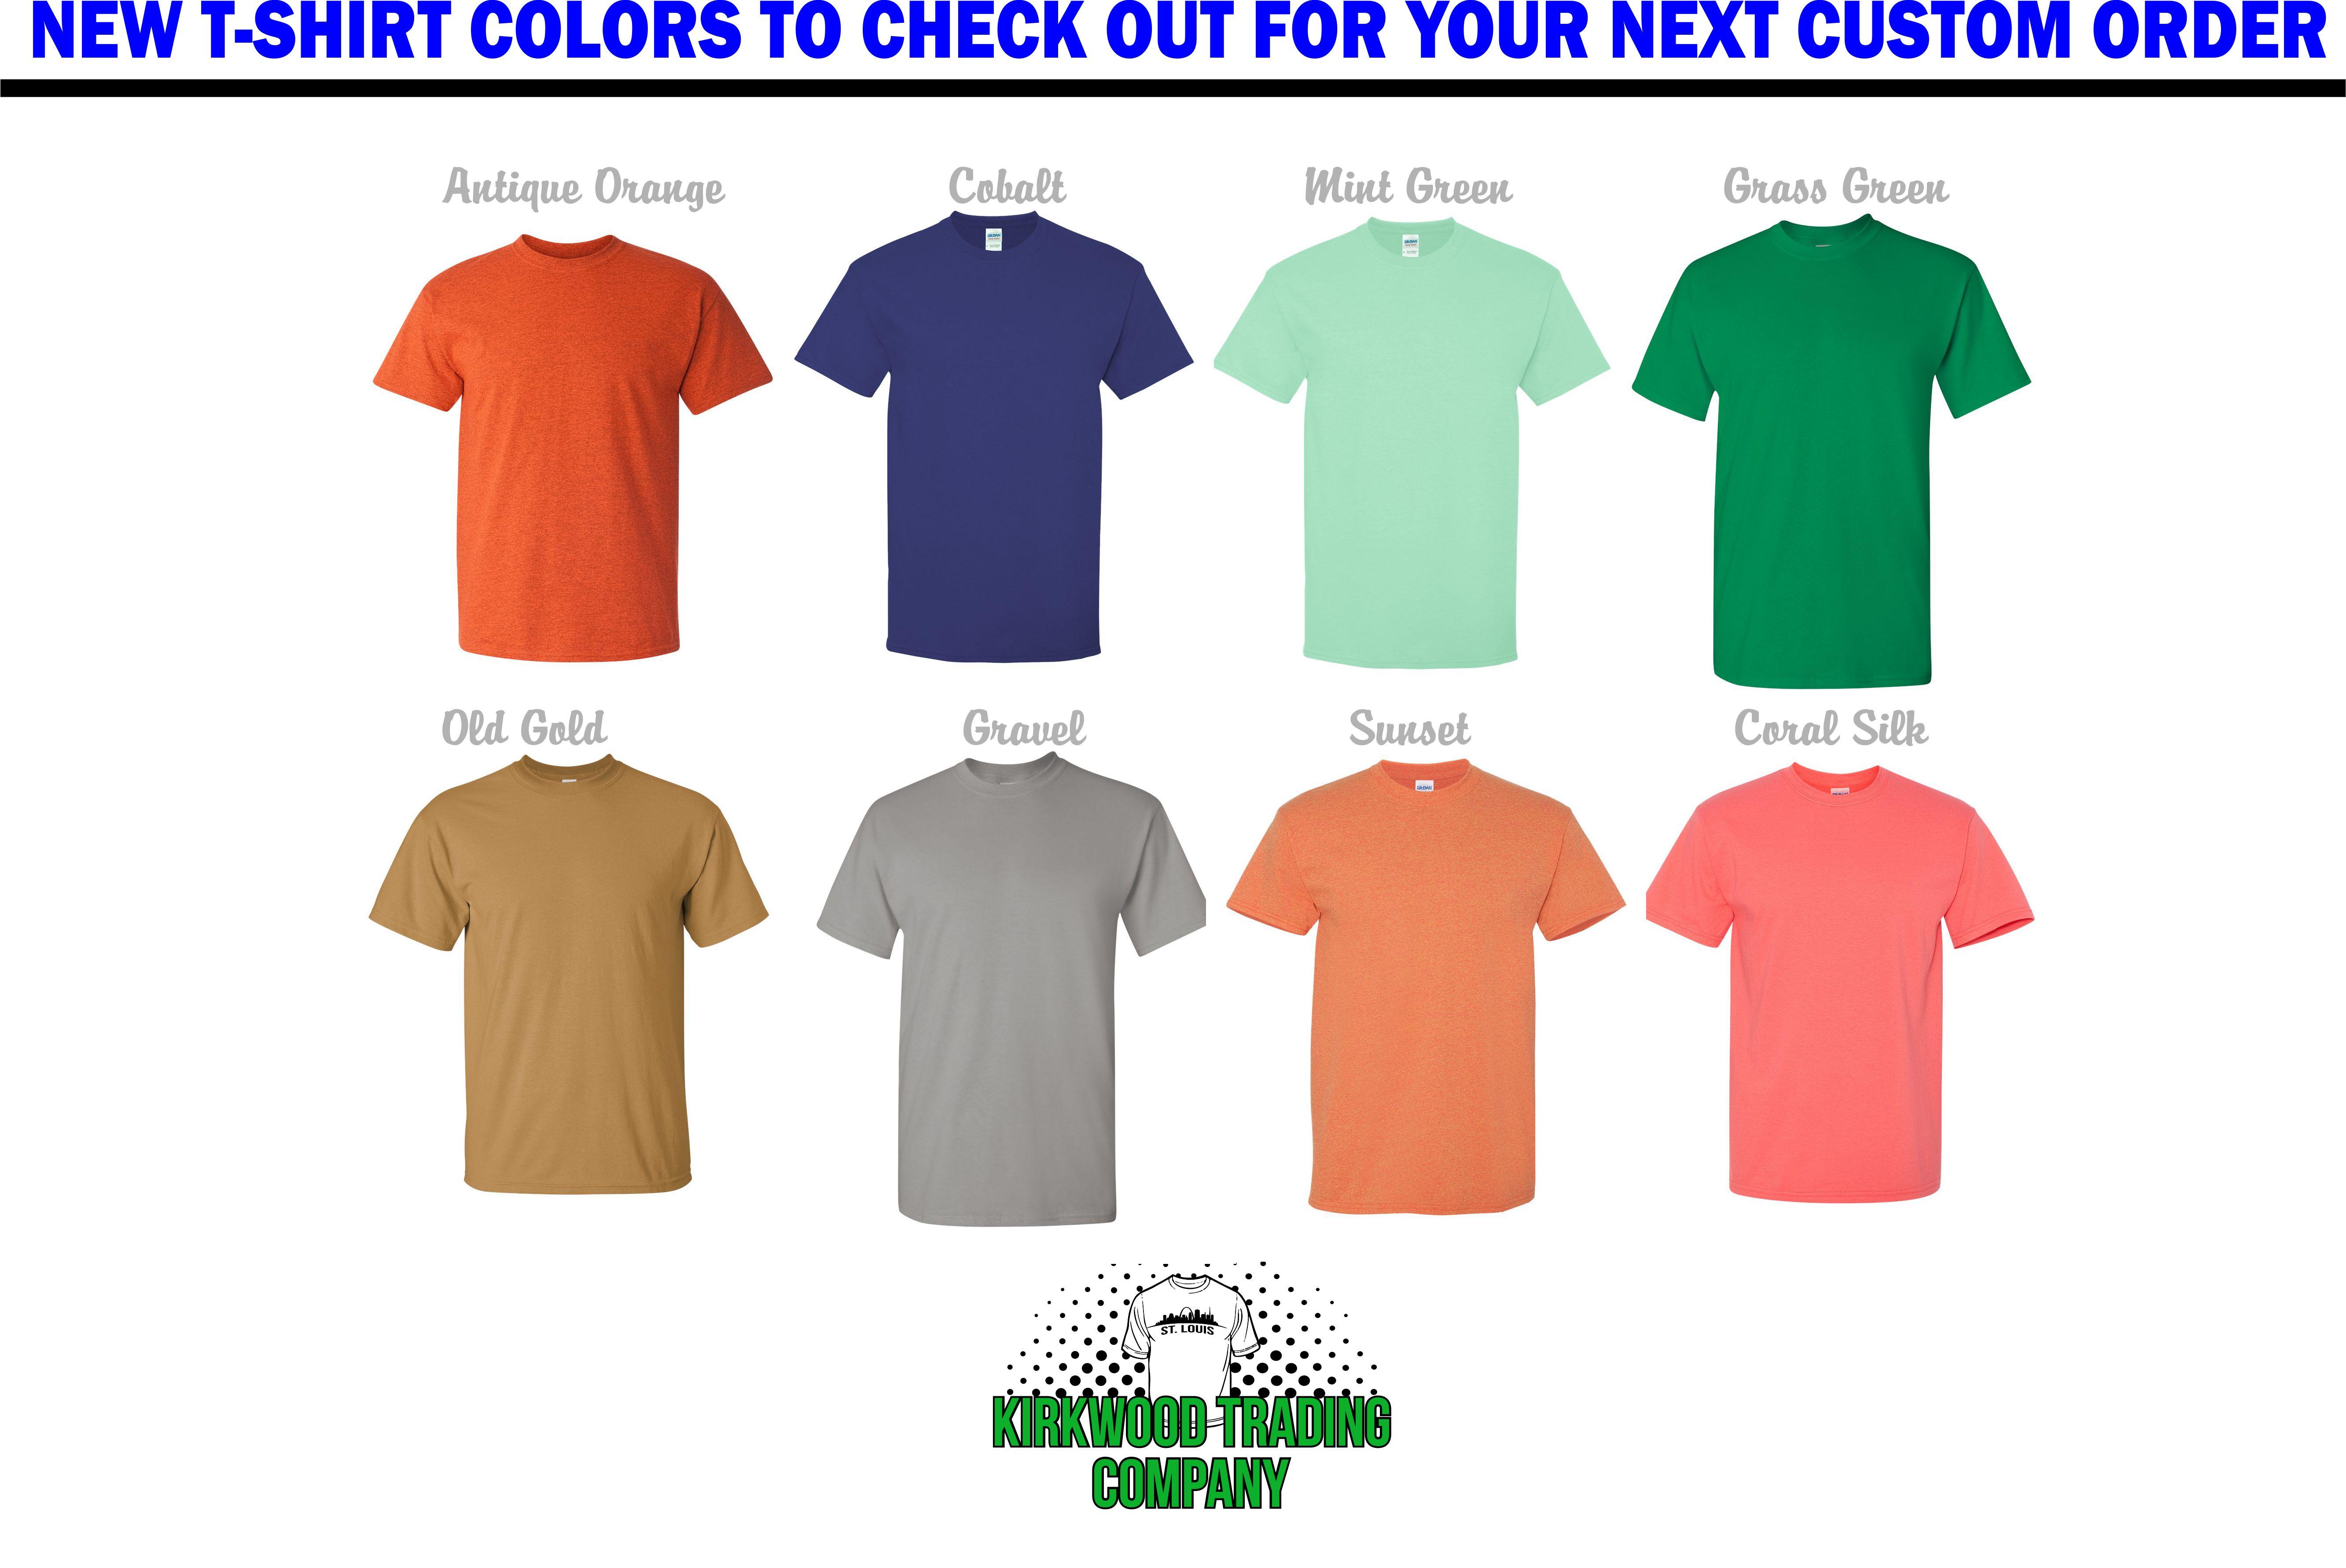 5932a0a74 New Custom T-shirt colors